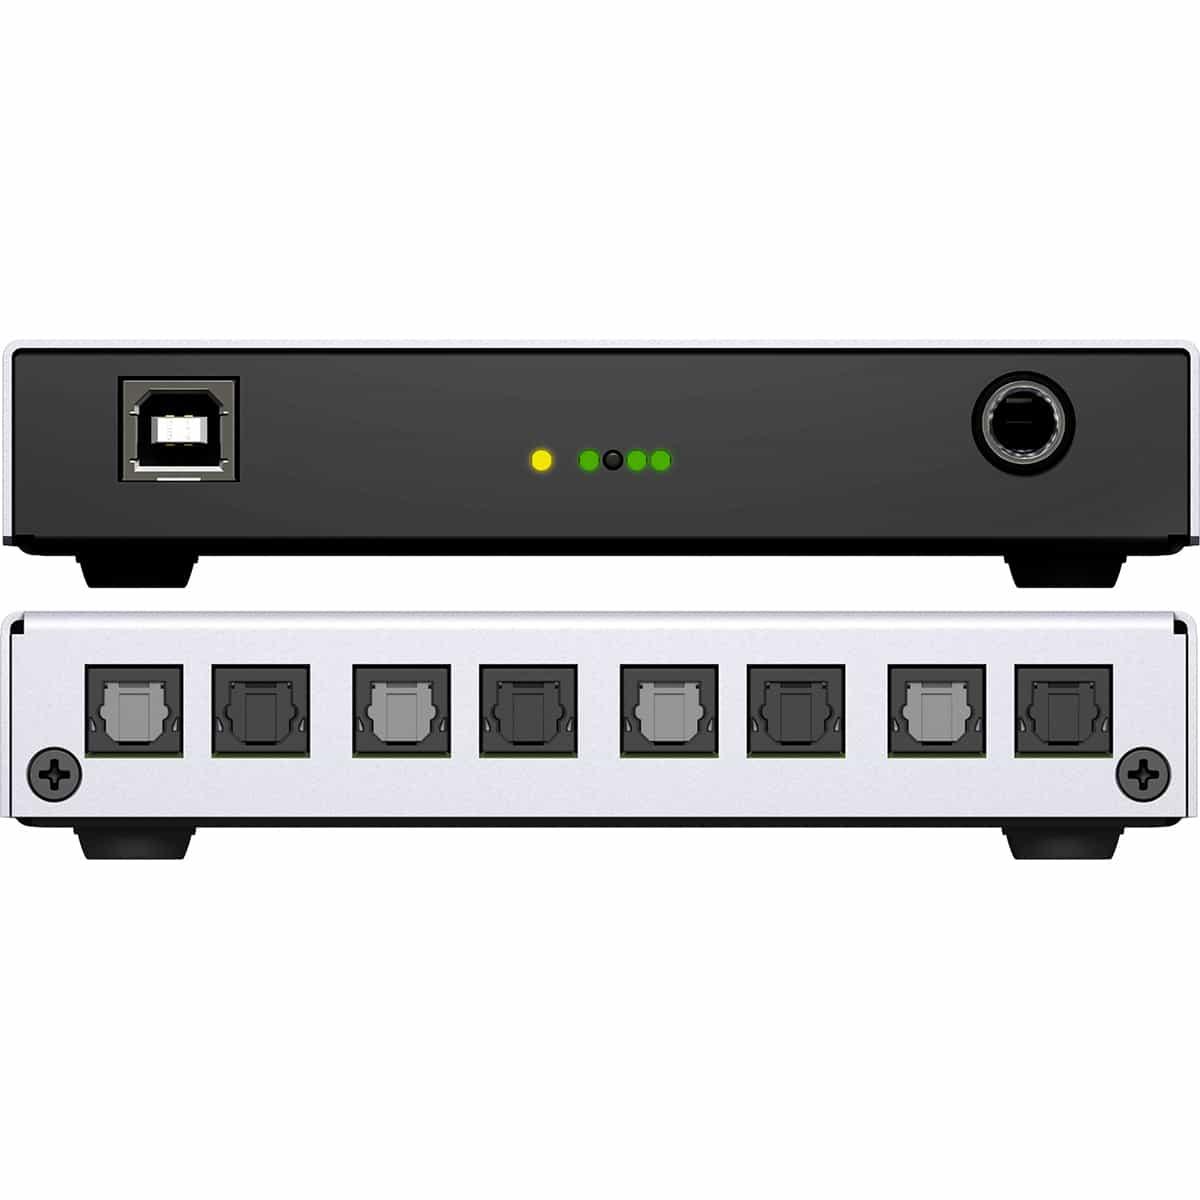 RME Digiface Usb 02 Pro Audio, Audio Digitale Convertitori e Schede Audio, Schede Audio per PC e MAC